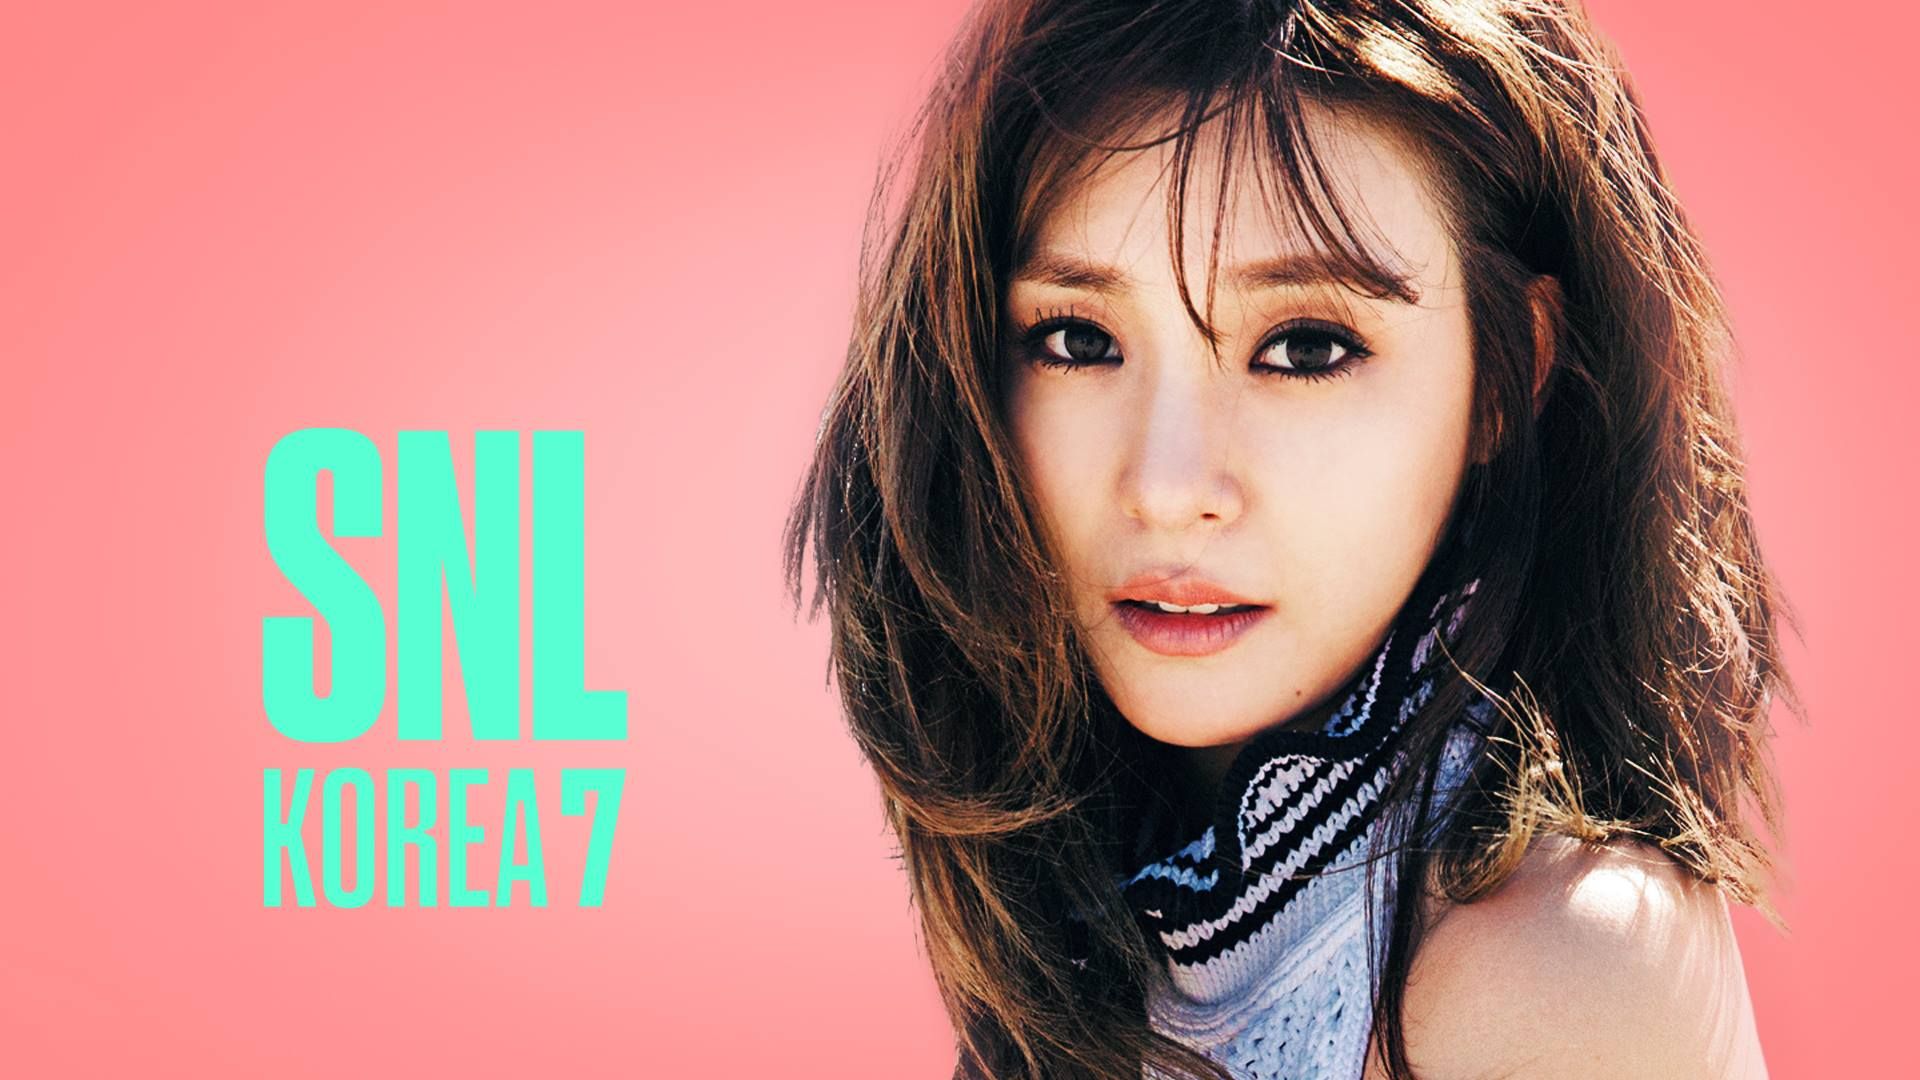 sone們~~~Tiffany以solo回歸之後行程真的爆多!但一聽說她即將要出演《SNL Korea7》的消息,粉絲都非常興奮!